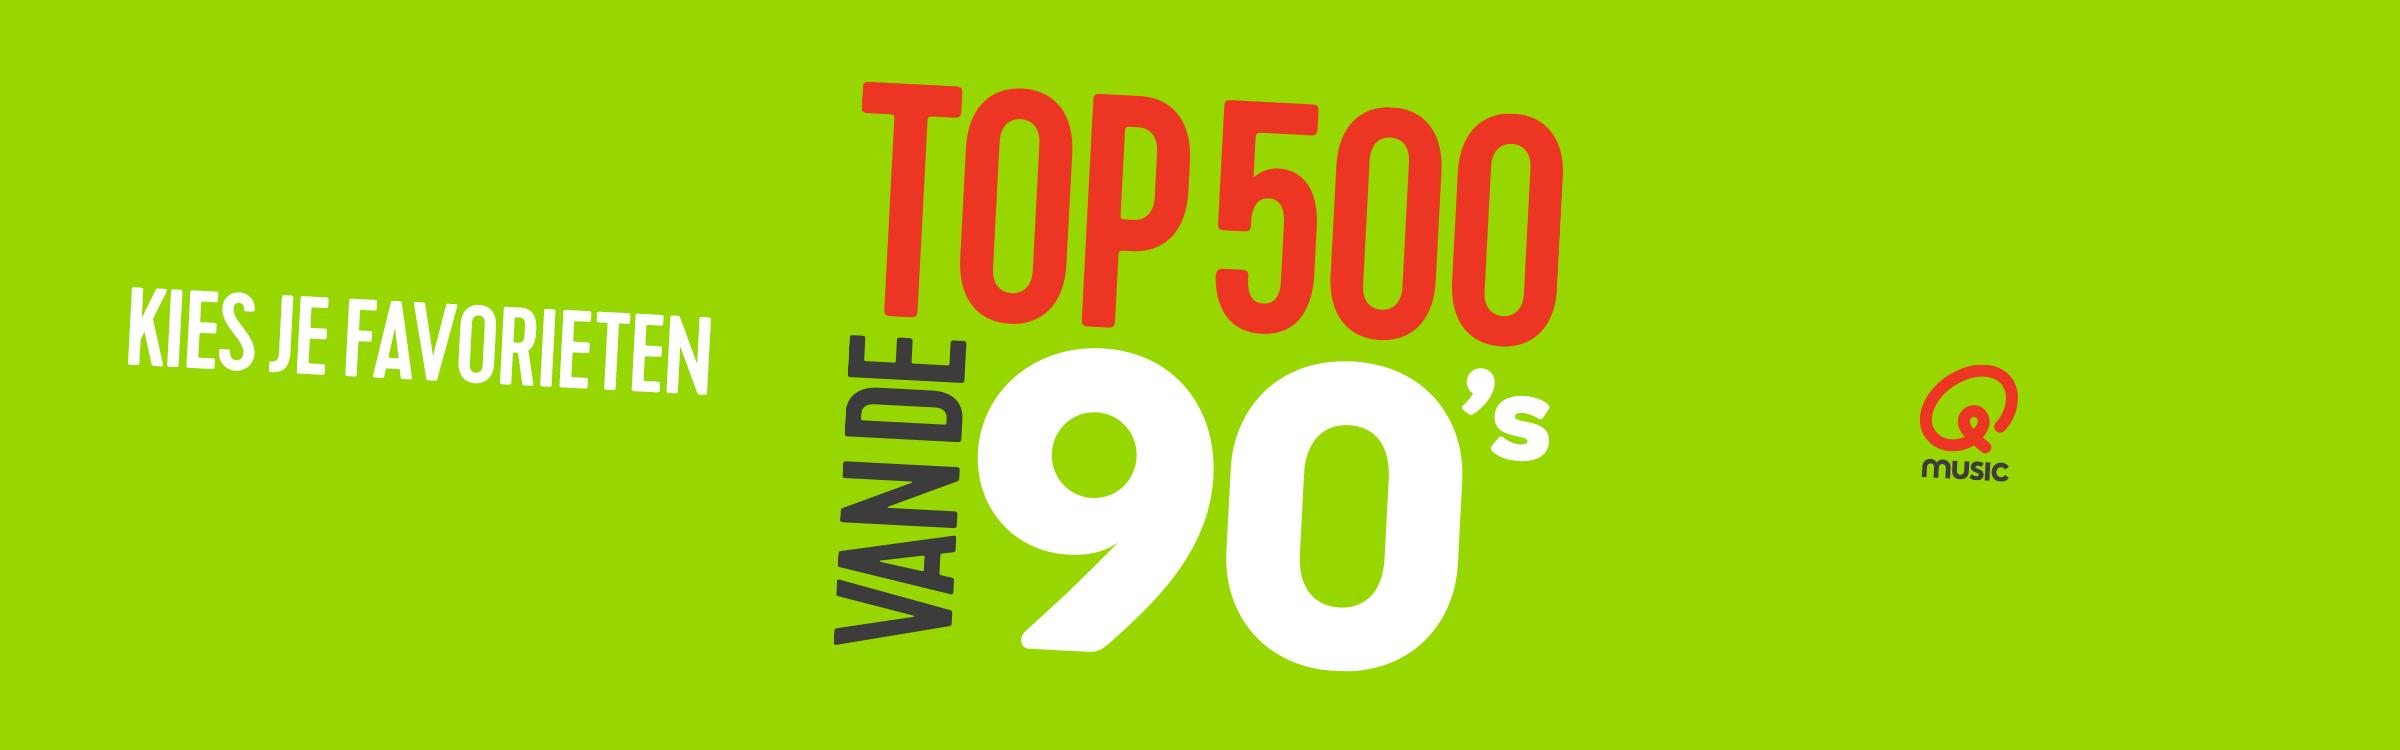 Qmusic actionheader 90s